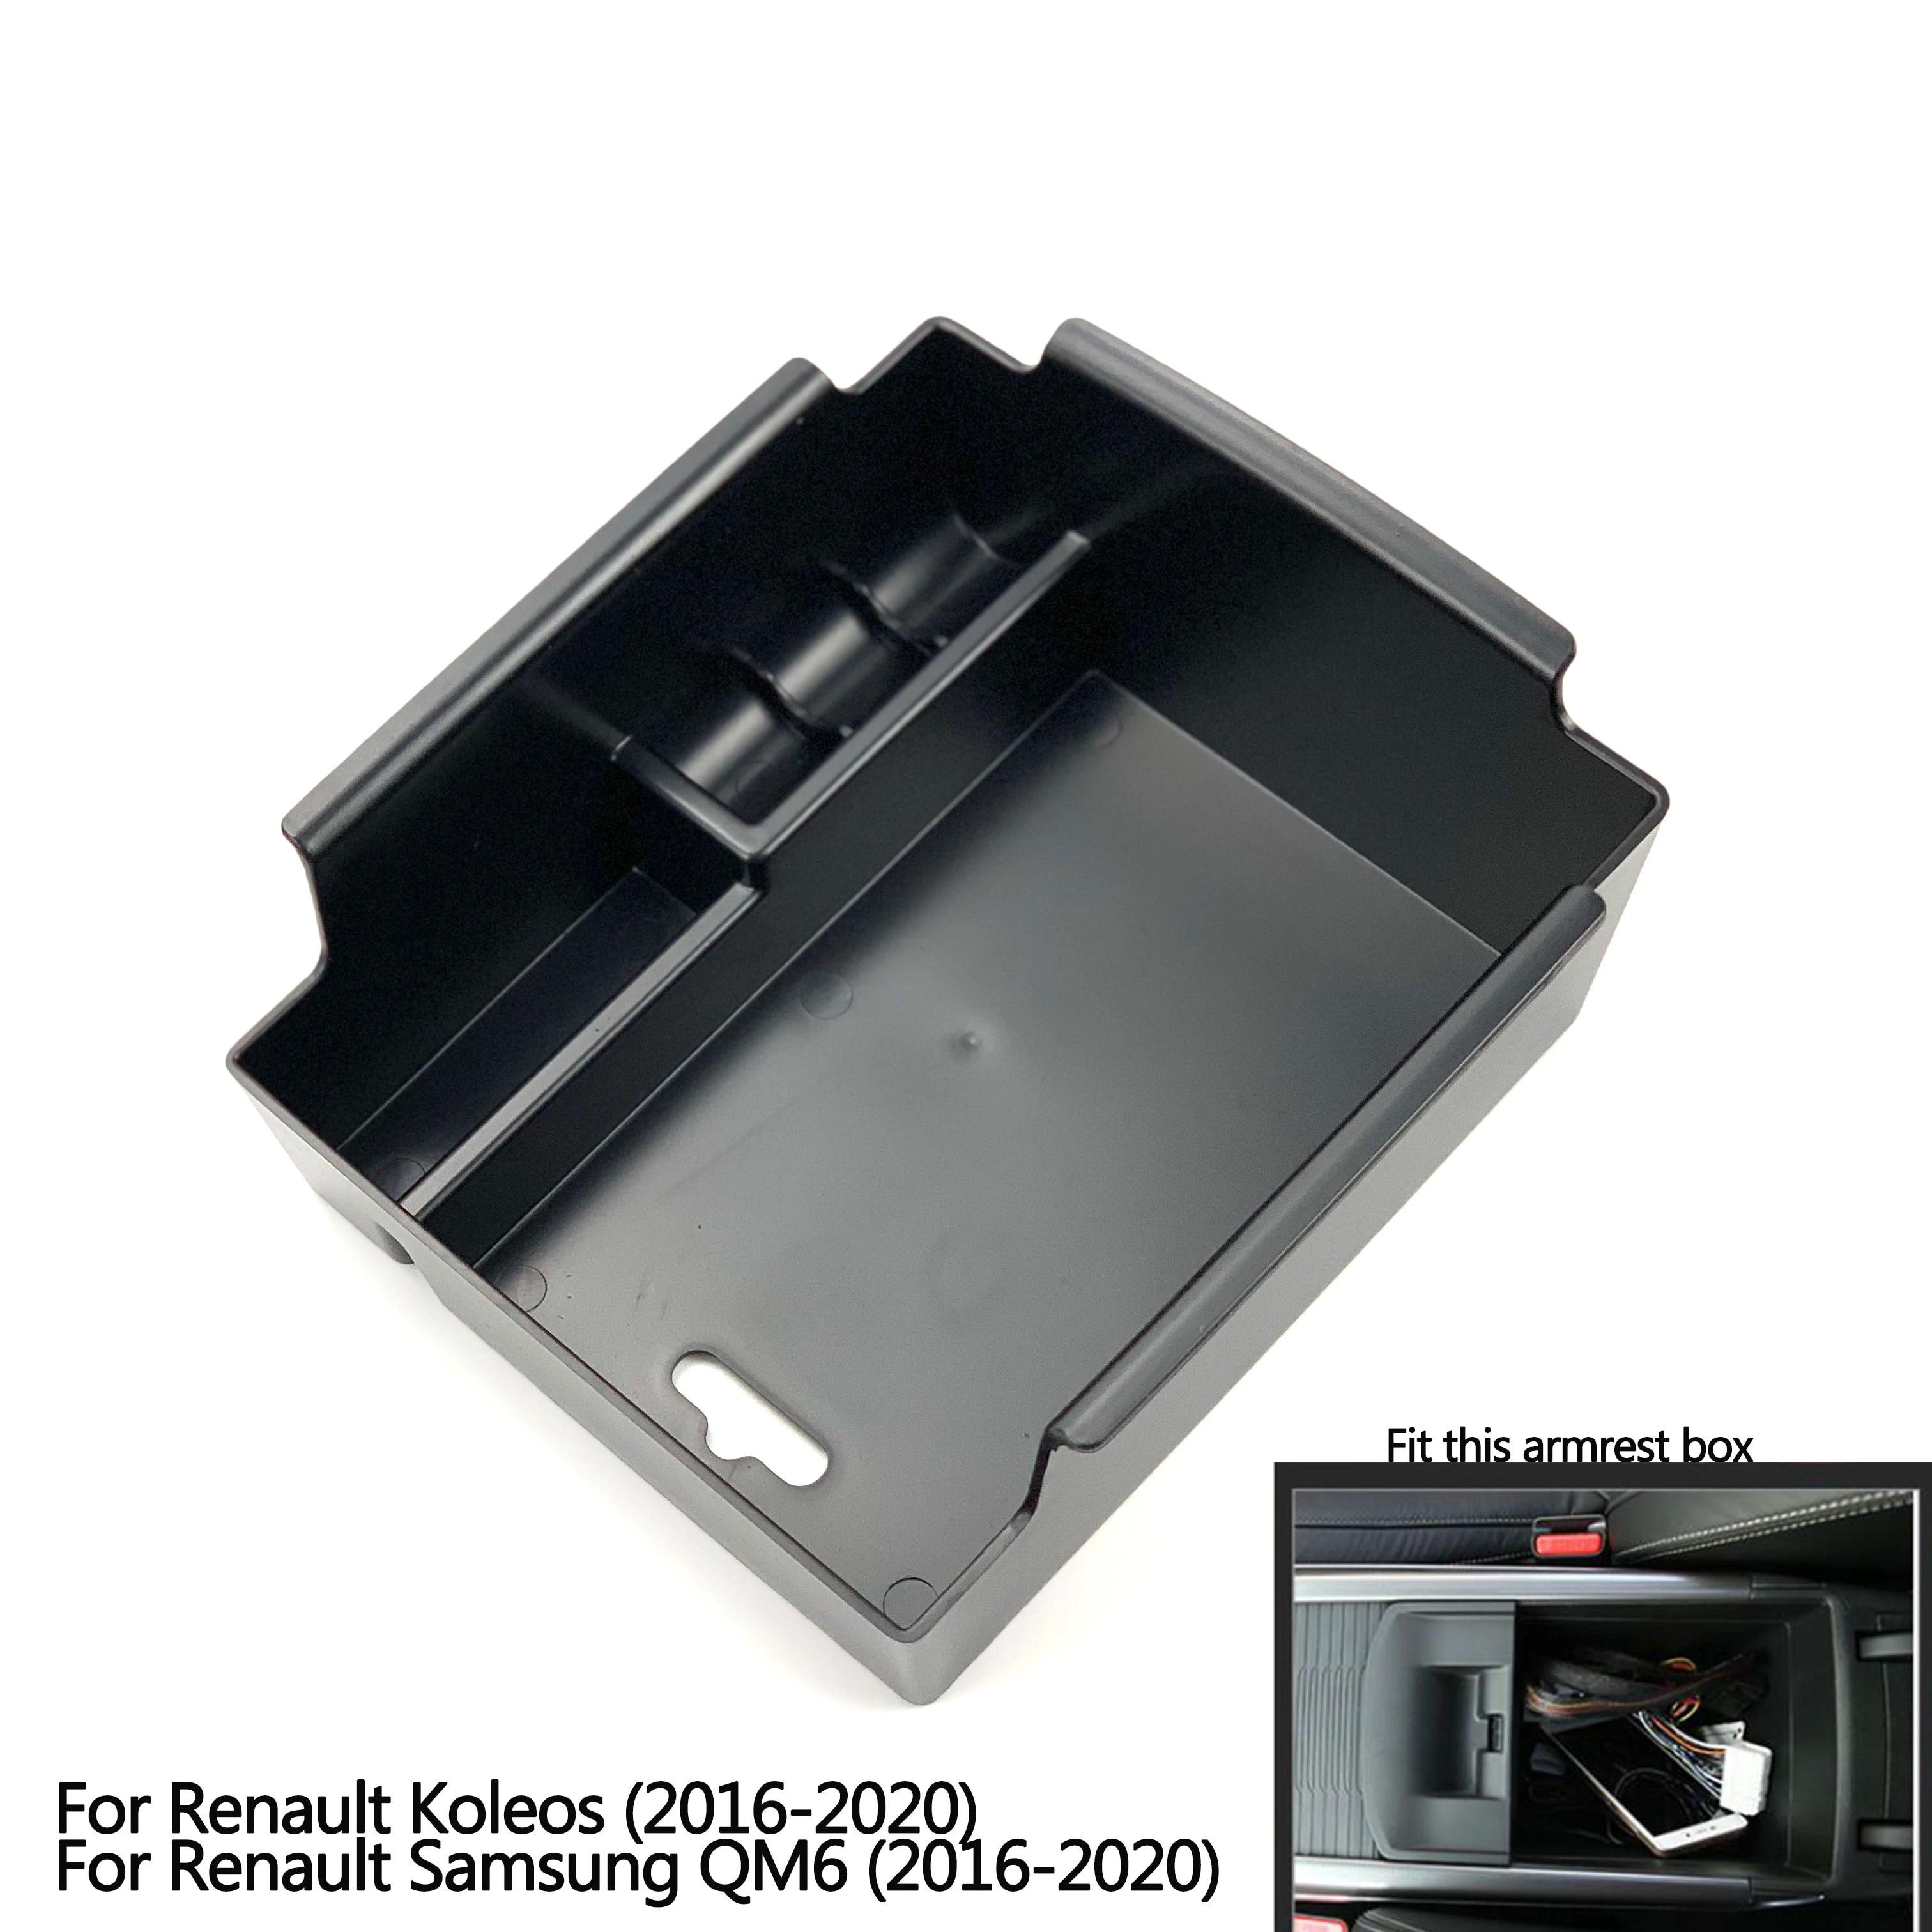 Bwen fsx1126w CHR Central Console Armrest Box Cover Car Armrest Cover Saver for 2017 2018 2019 Toyota CH-R,Black /& Blue